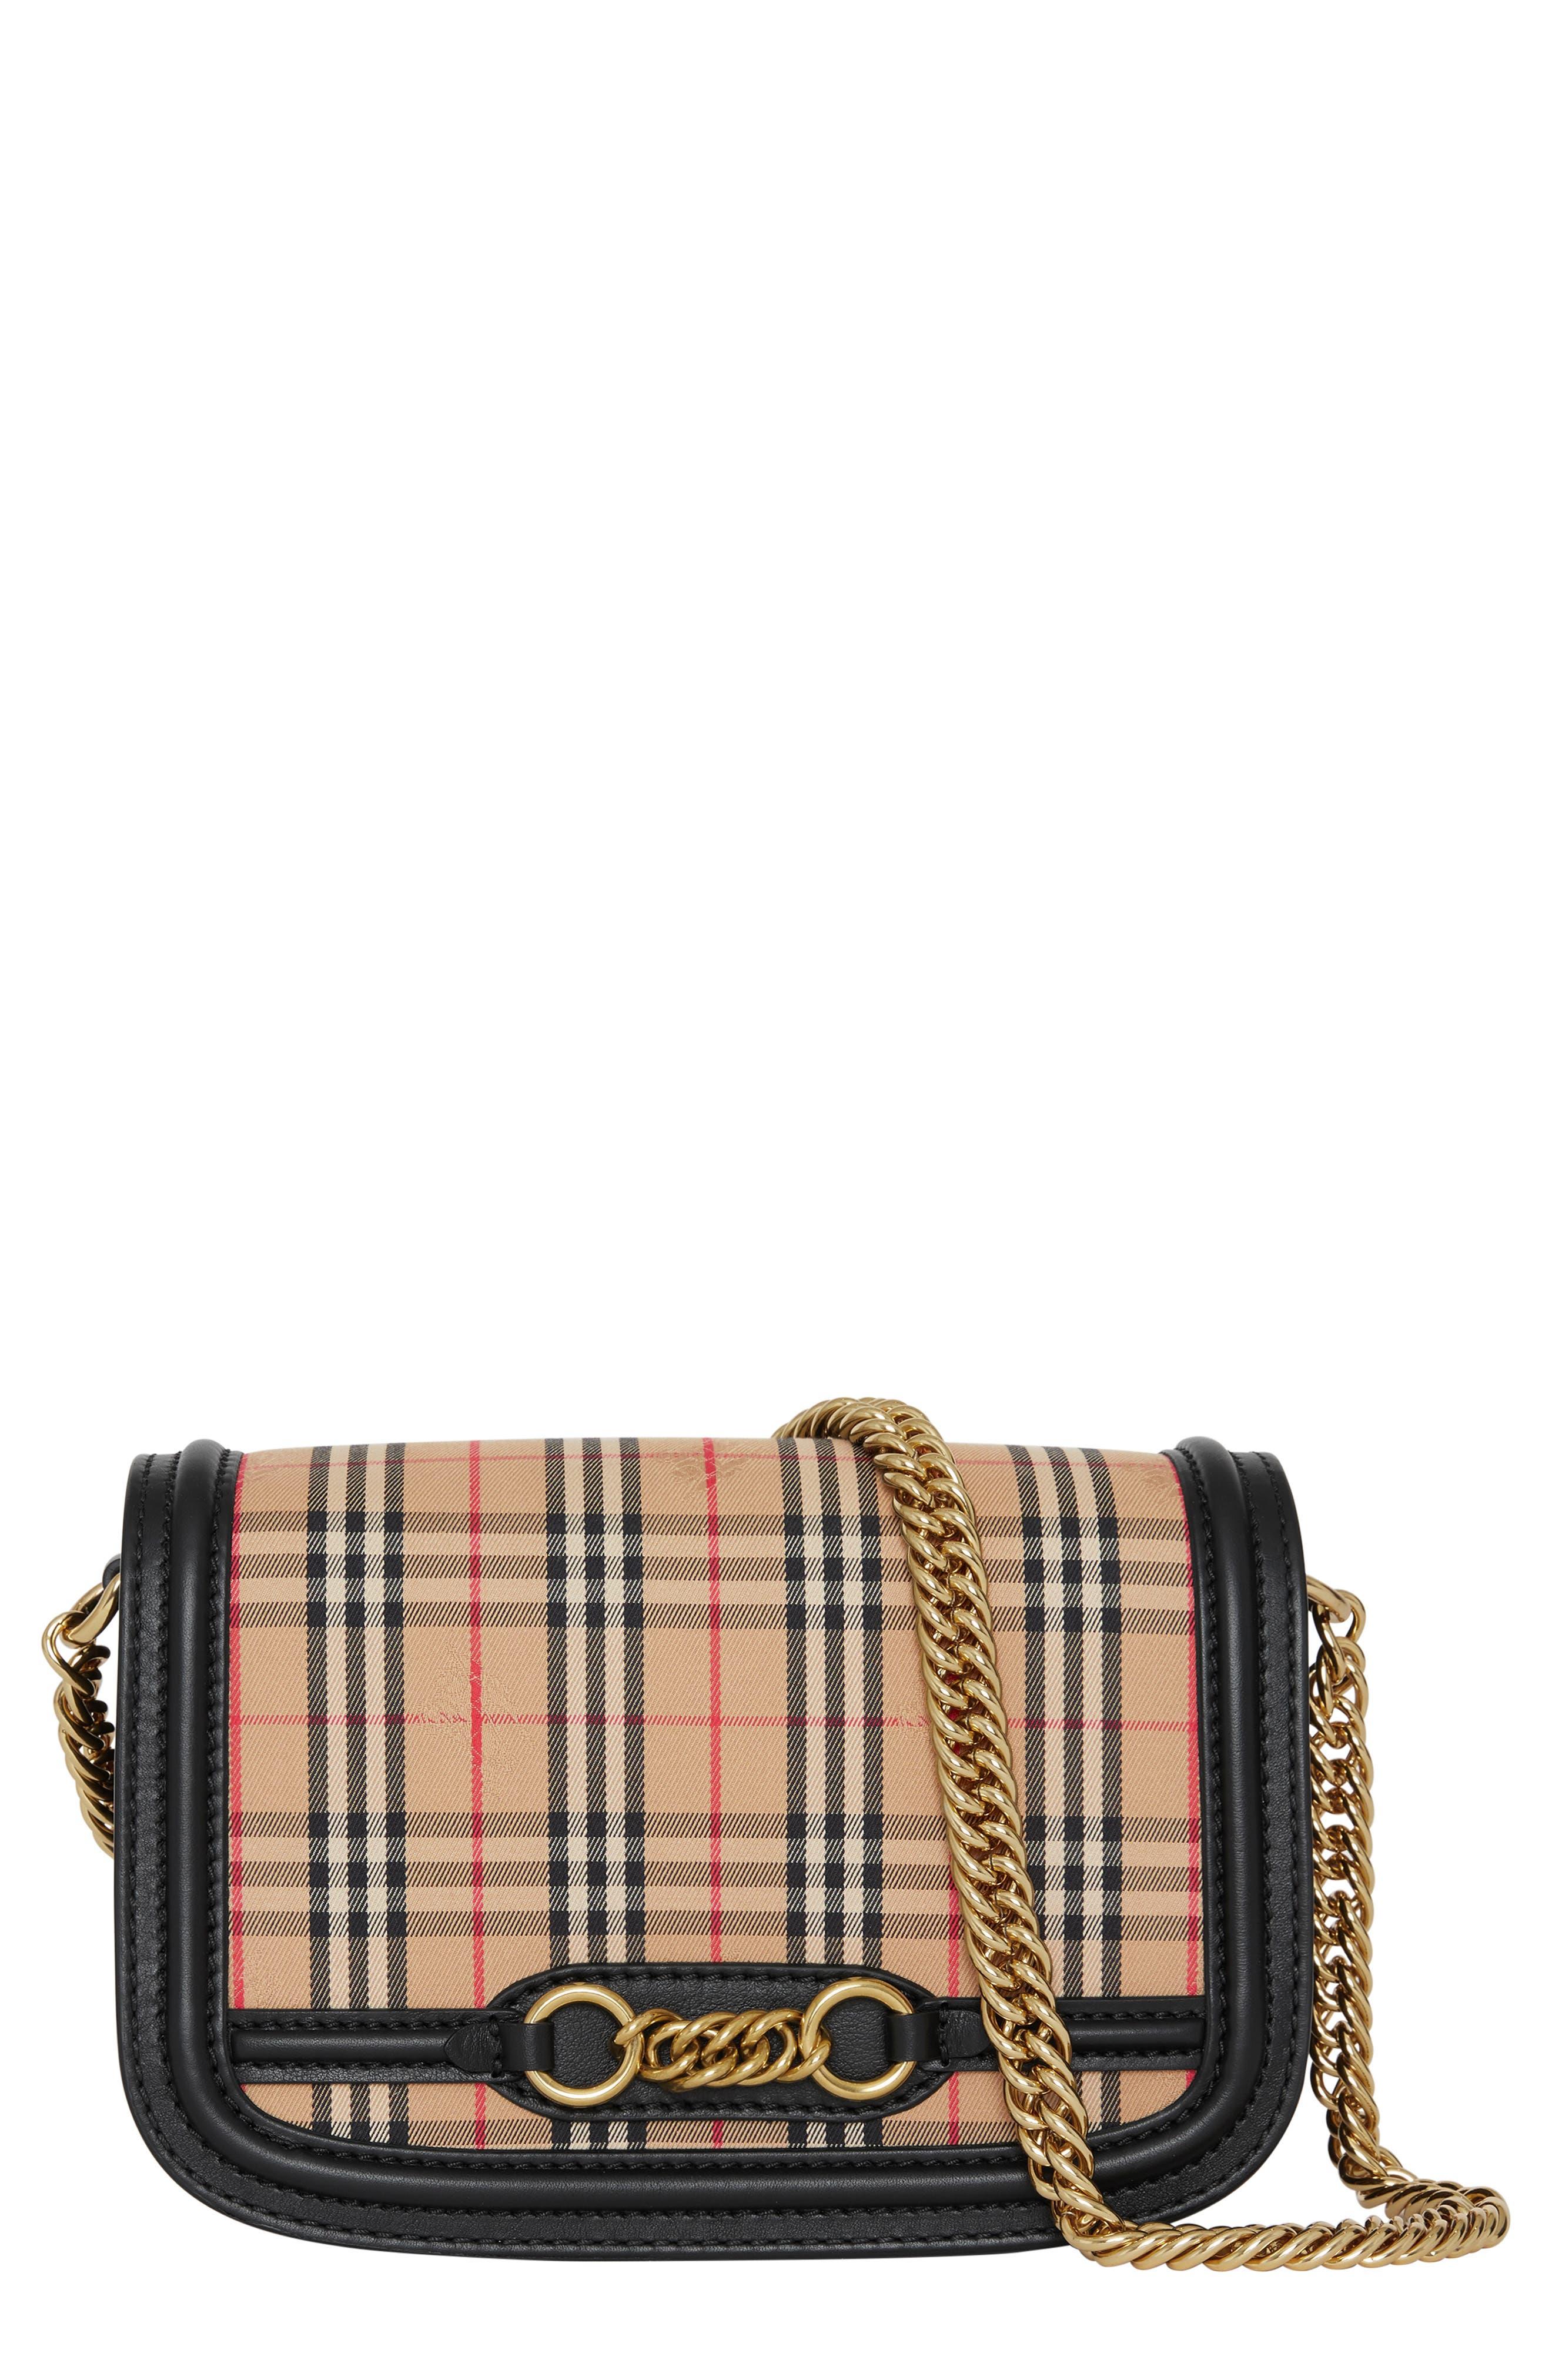 Vintage Check Link Flap Crossbody Bag,                             Main thumbnail 1, color,                             BLACK